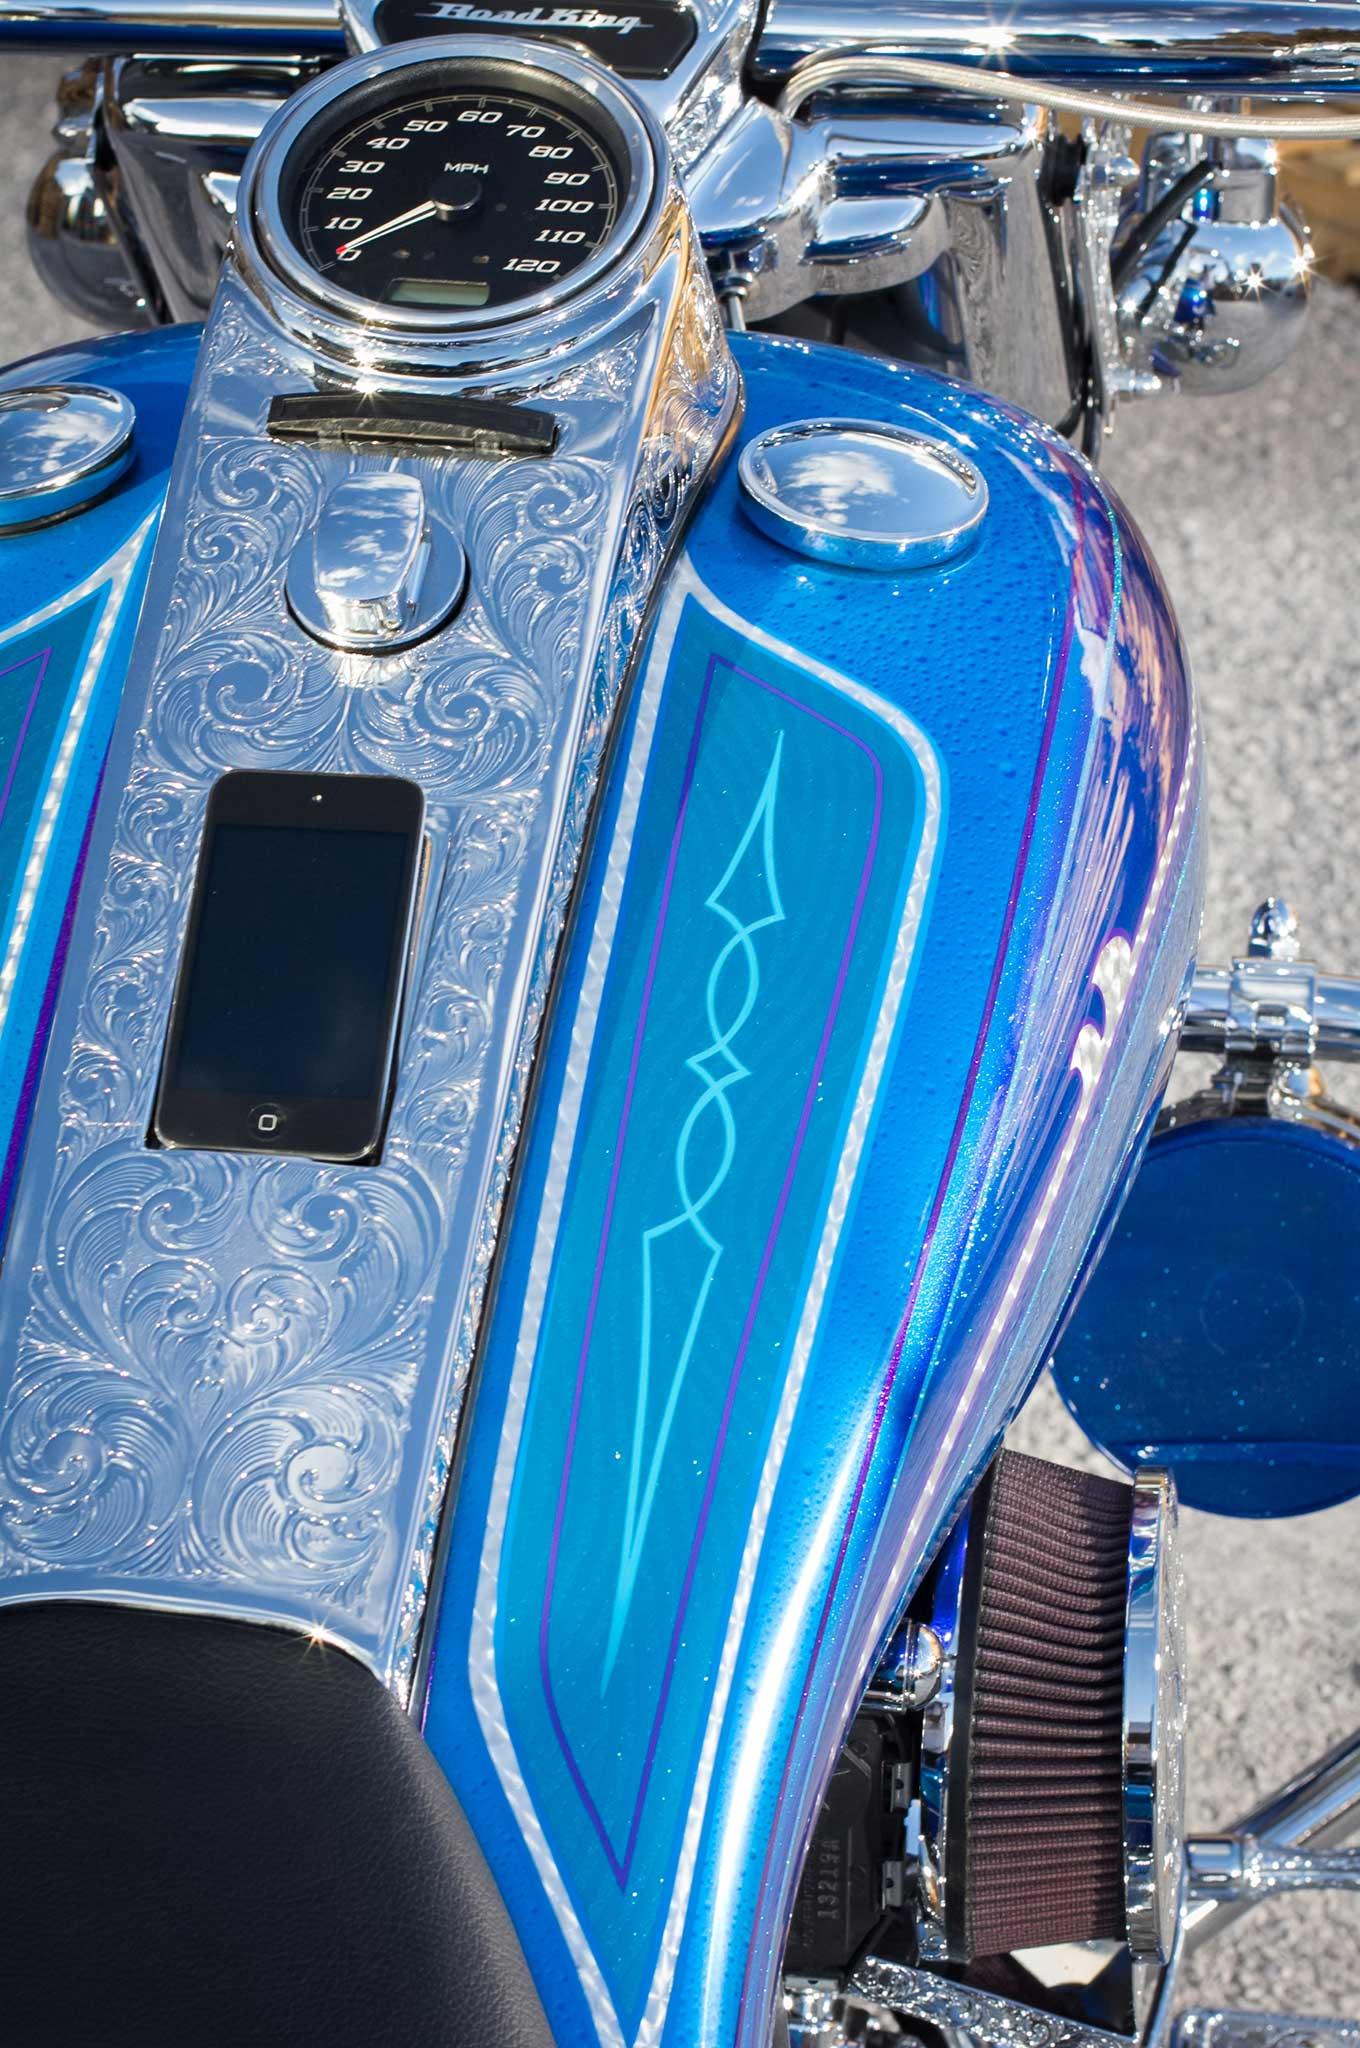 22 Inch Tires >> 2014 Harley-Davidson Road King - Show Winner